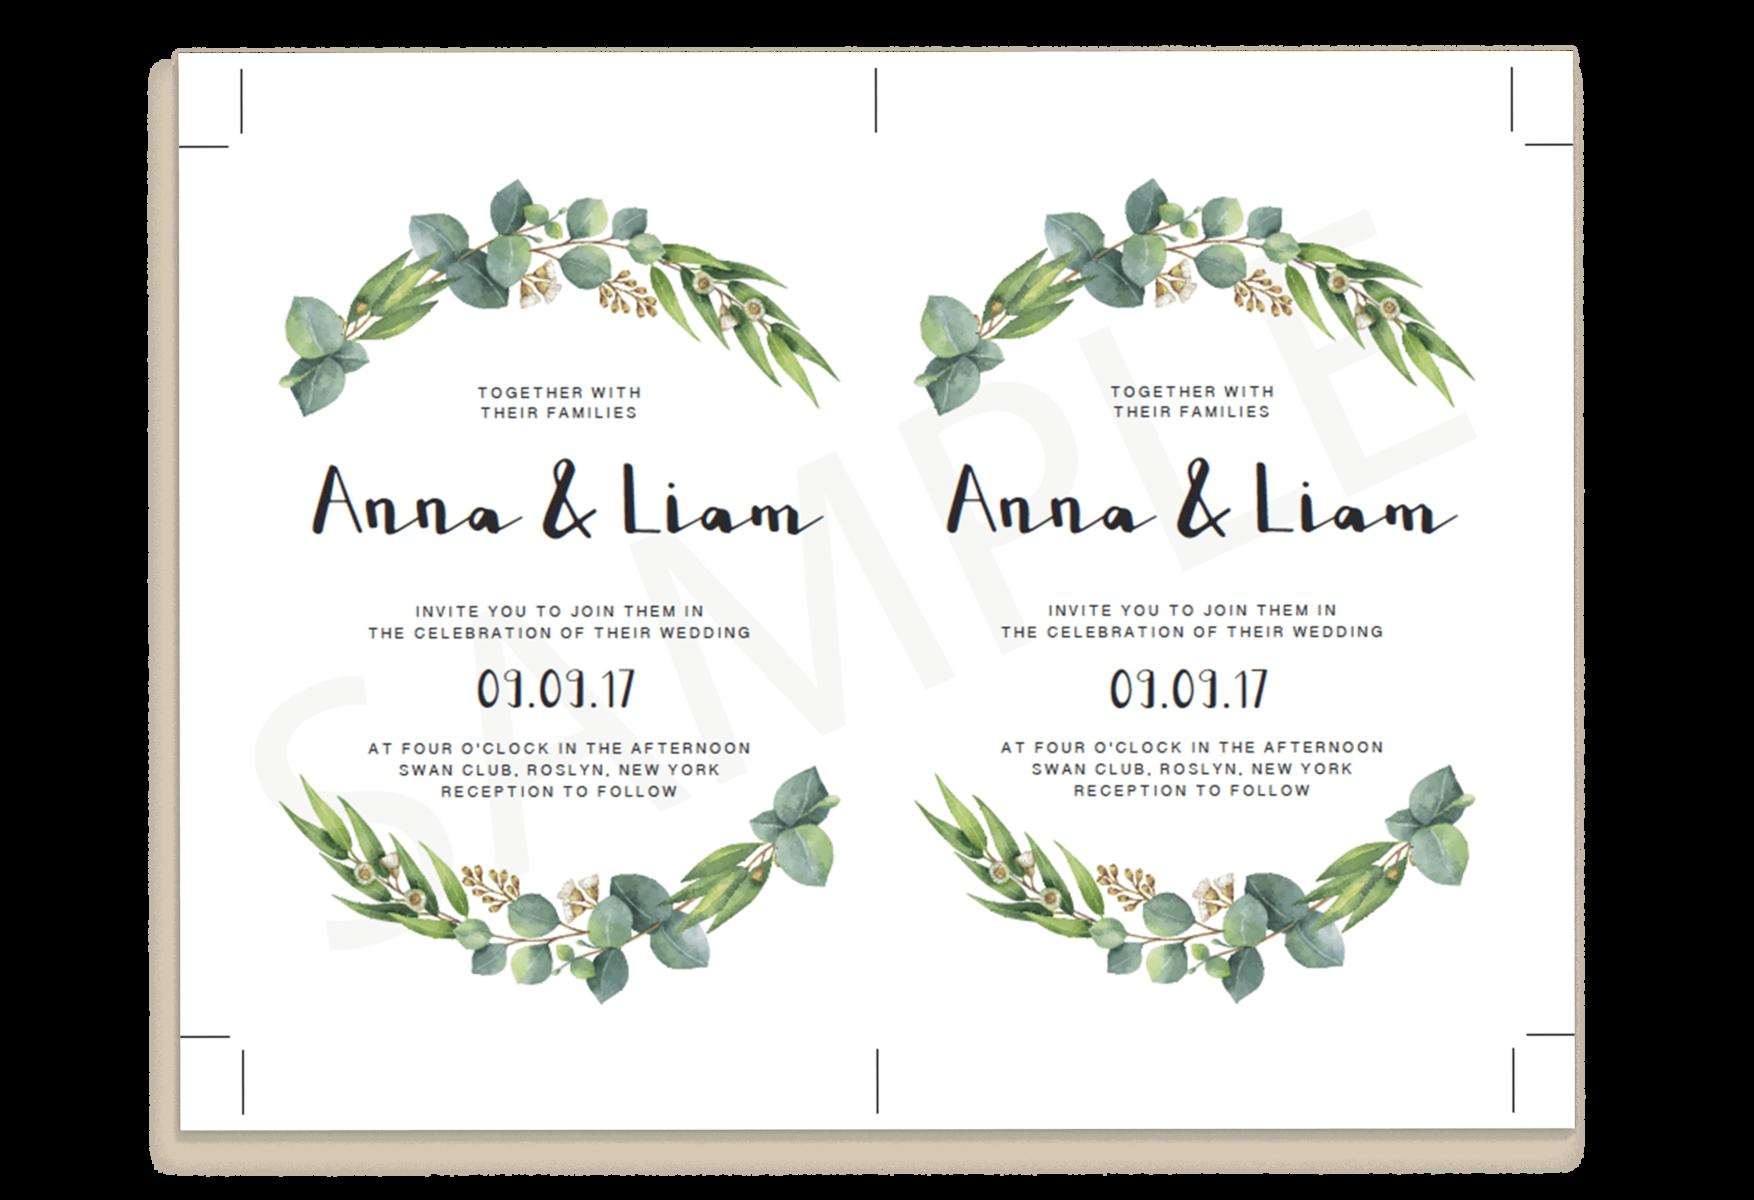 Wedding Invitation Samples Free Templates: Download A Free Sample Wedding Invitation Template